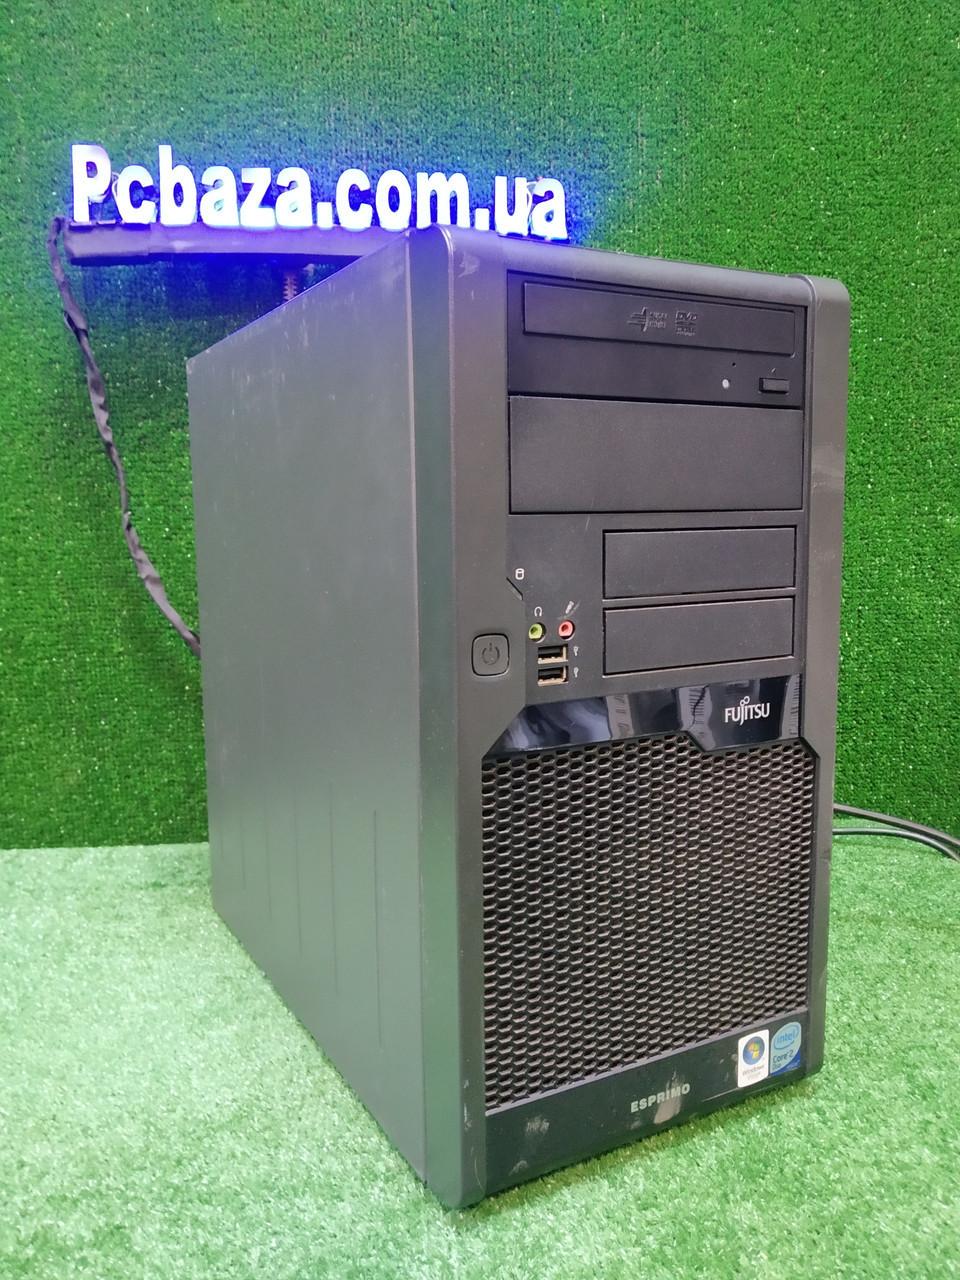 Компьютер Fujitsu, Intel 2 мощных ядра E8400 3.0Ггц, 4 ГБ, 80 ГБ Настроен! Есть Опт! Гарантия!